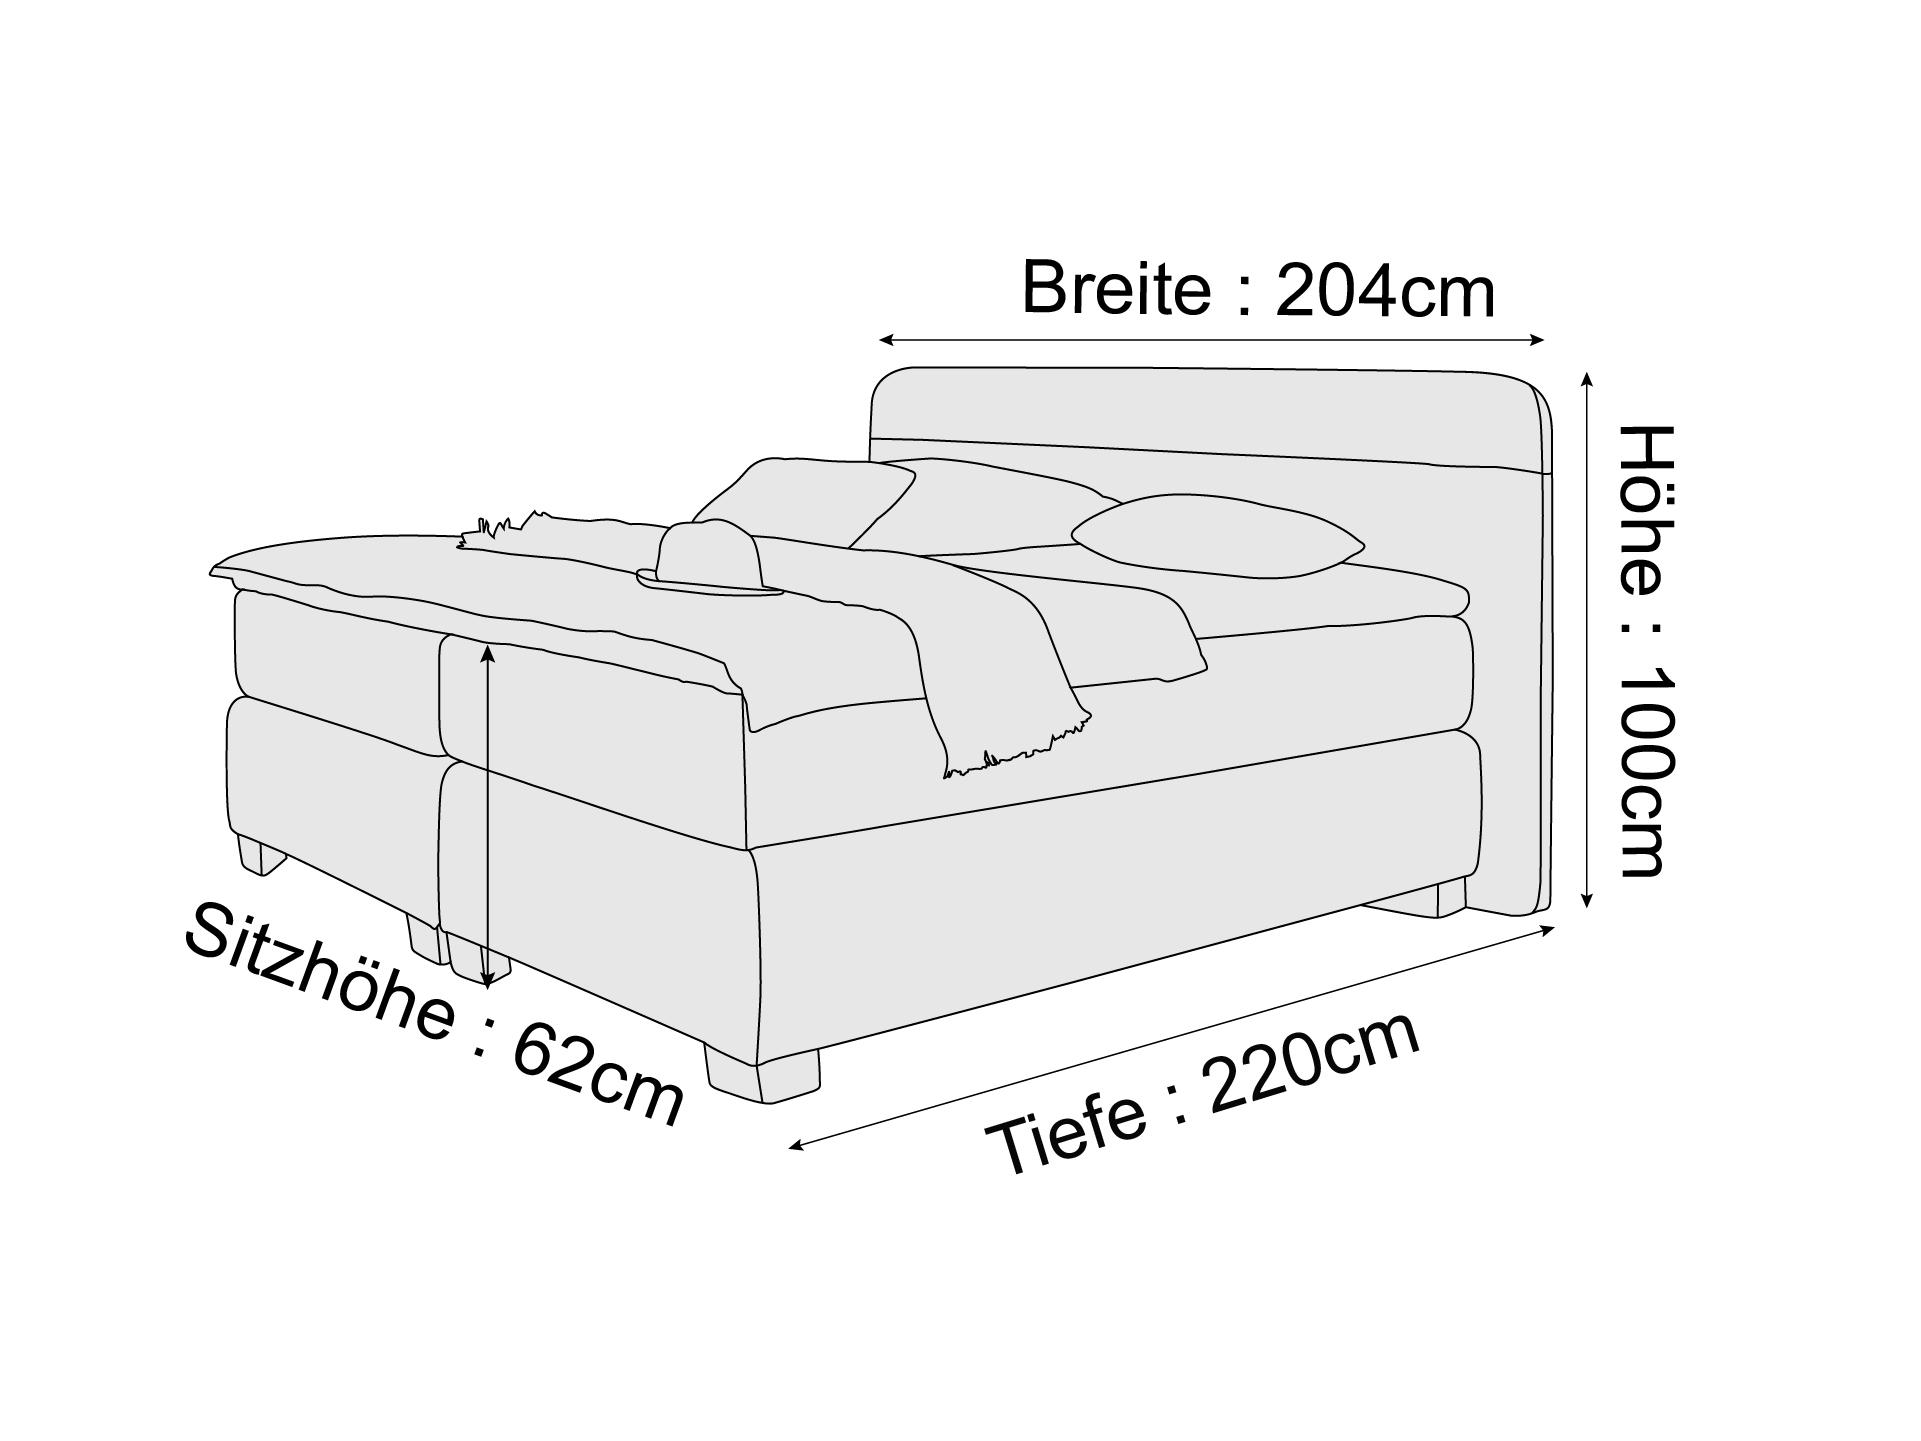 Skizze von Bellante